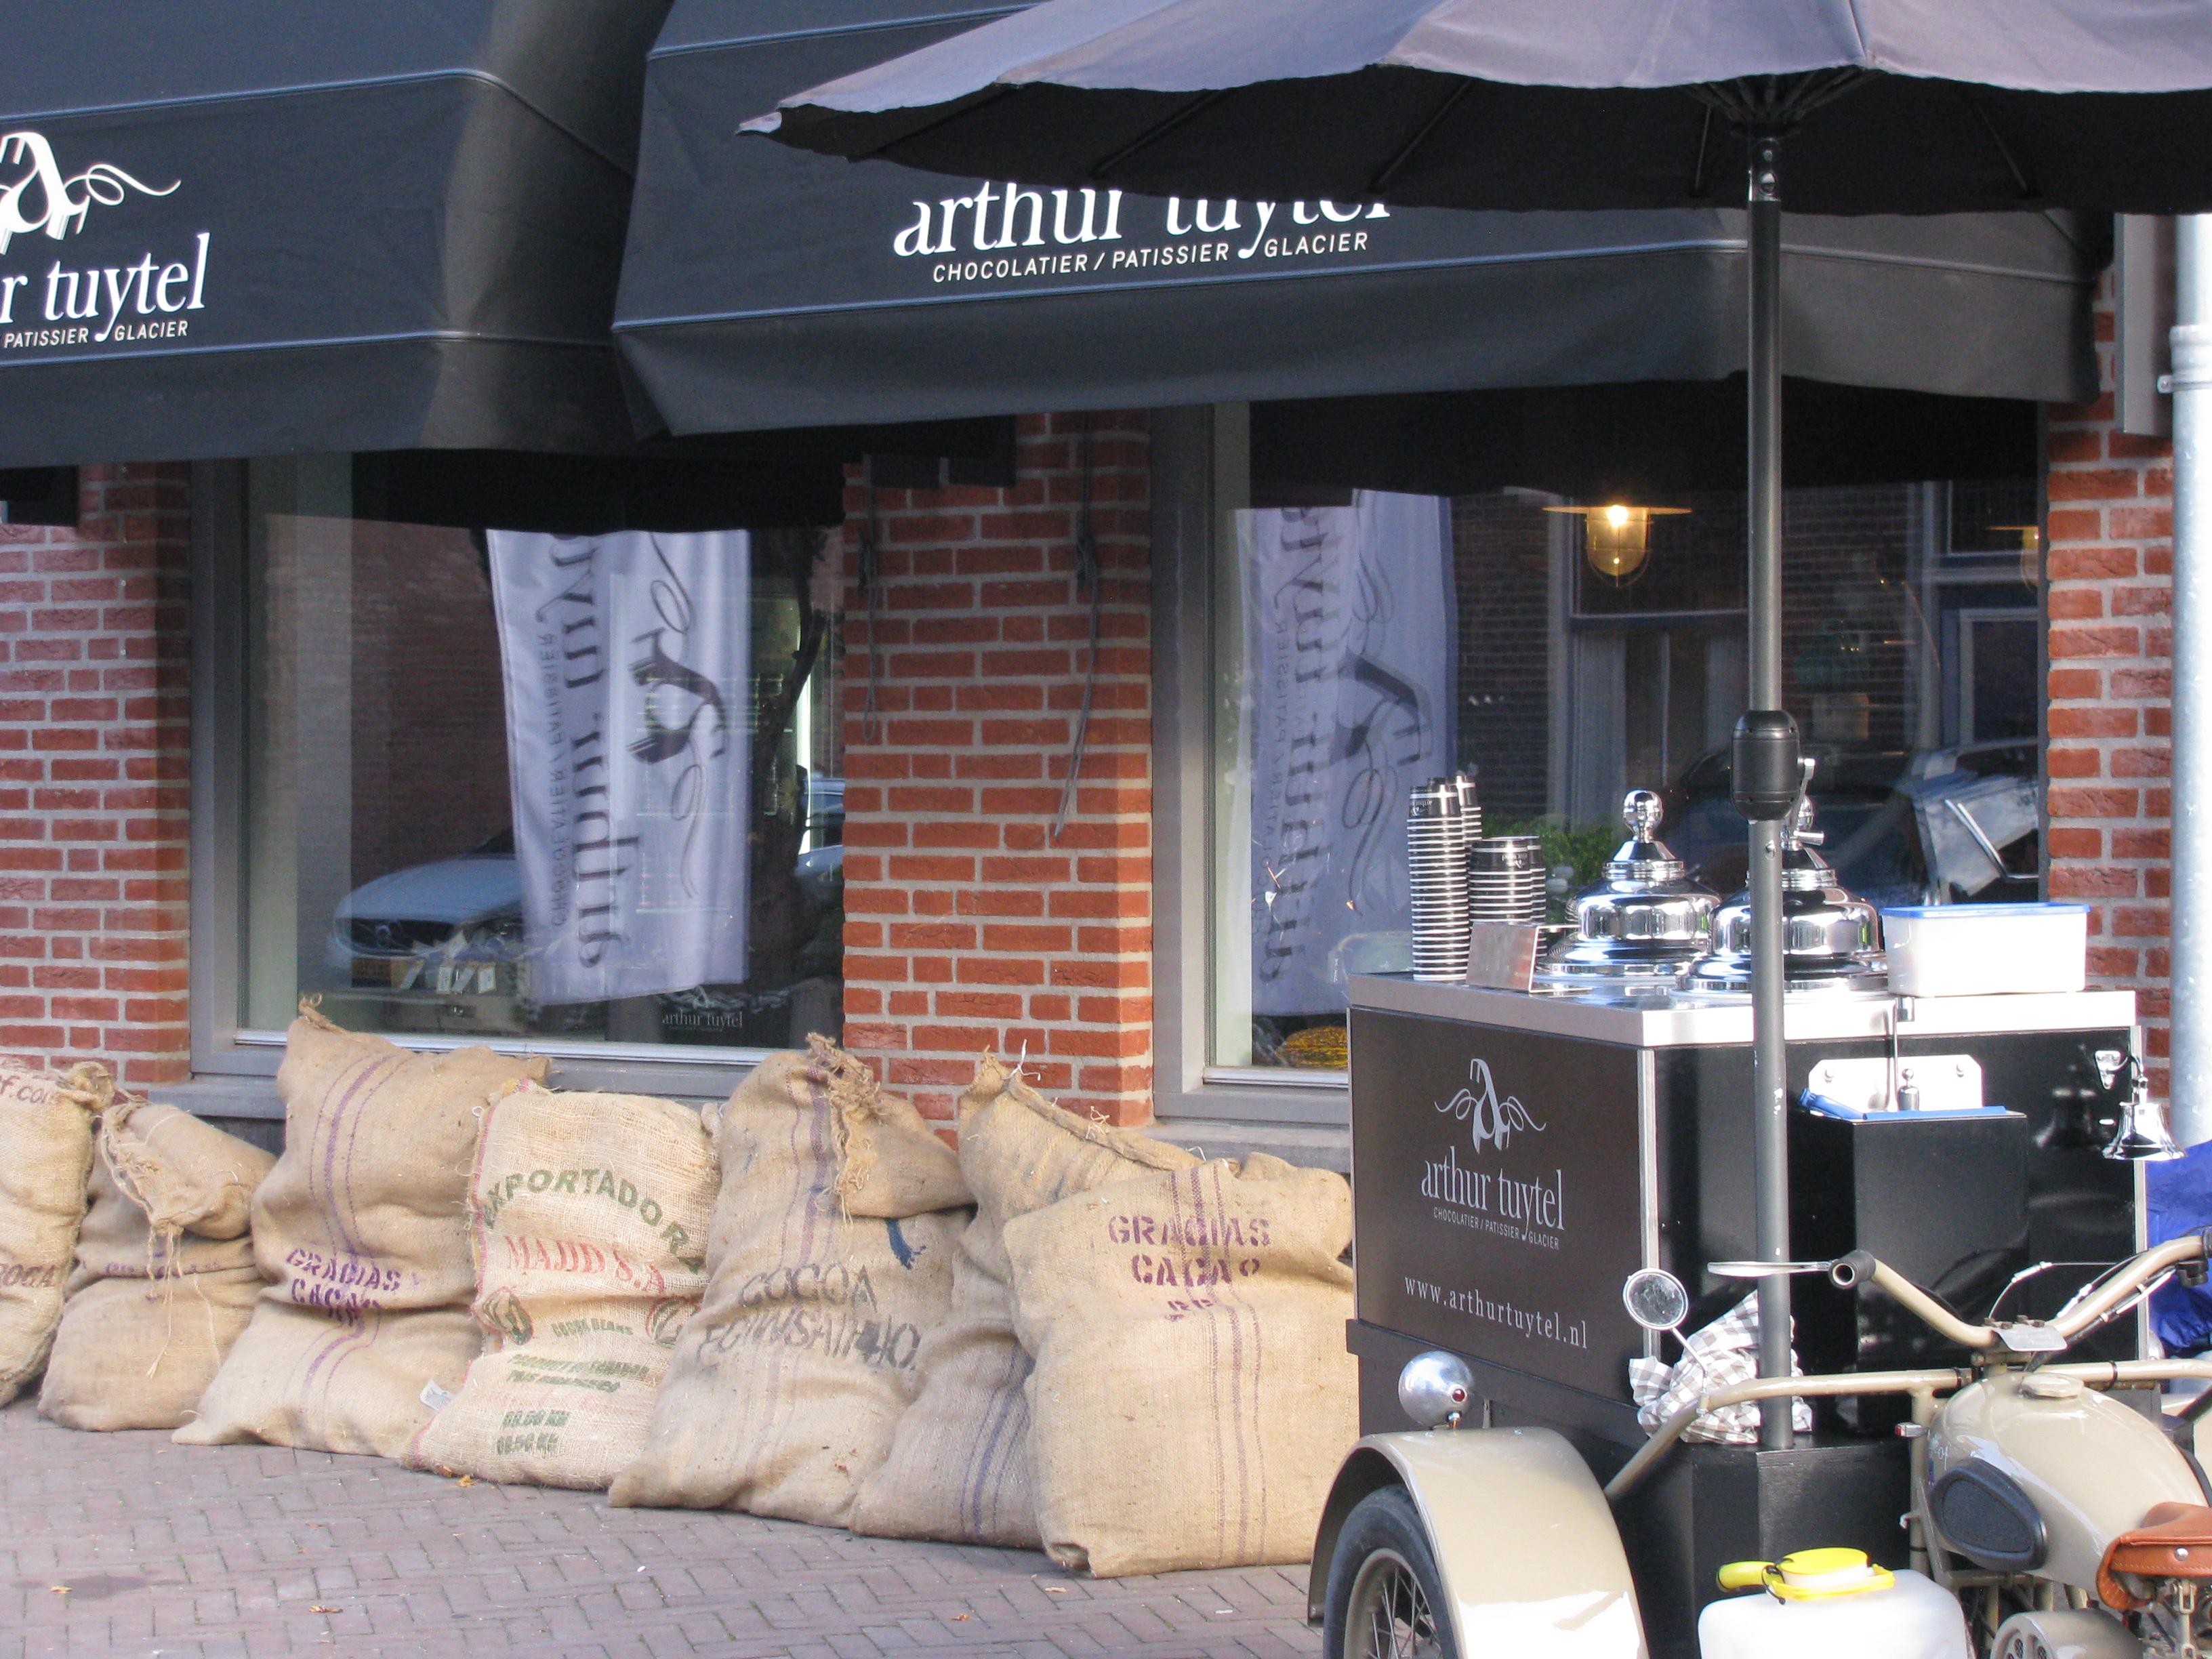 Arthur Tuytel winkel